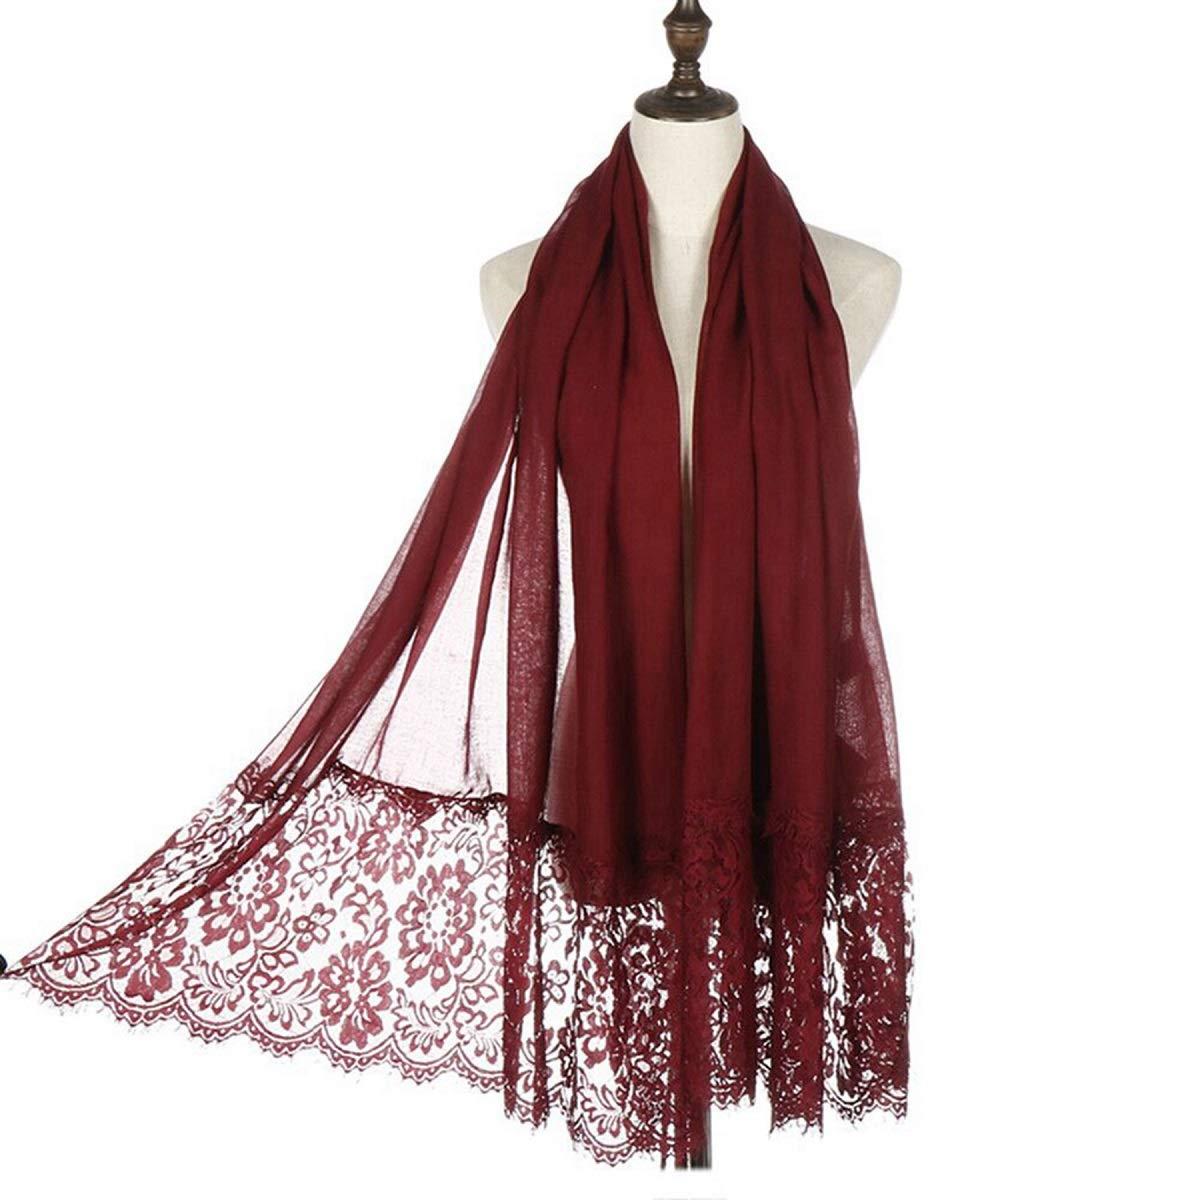 Women Fashion Scarf Wrap Shawl,RiscaWin Autumn Soft Lightweight Lace Scarves Wrap Warm Scarf(Wine Red)